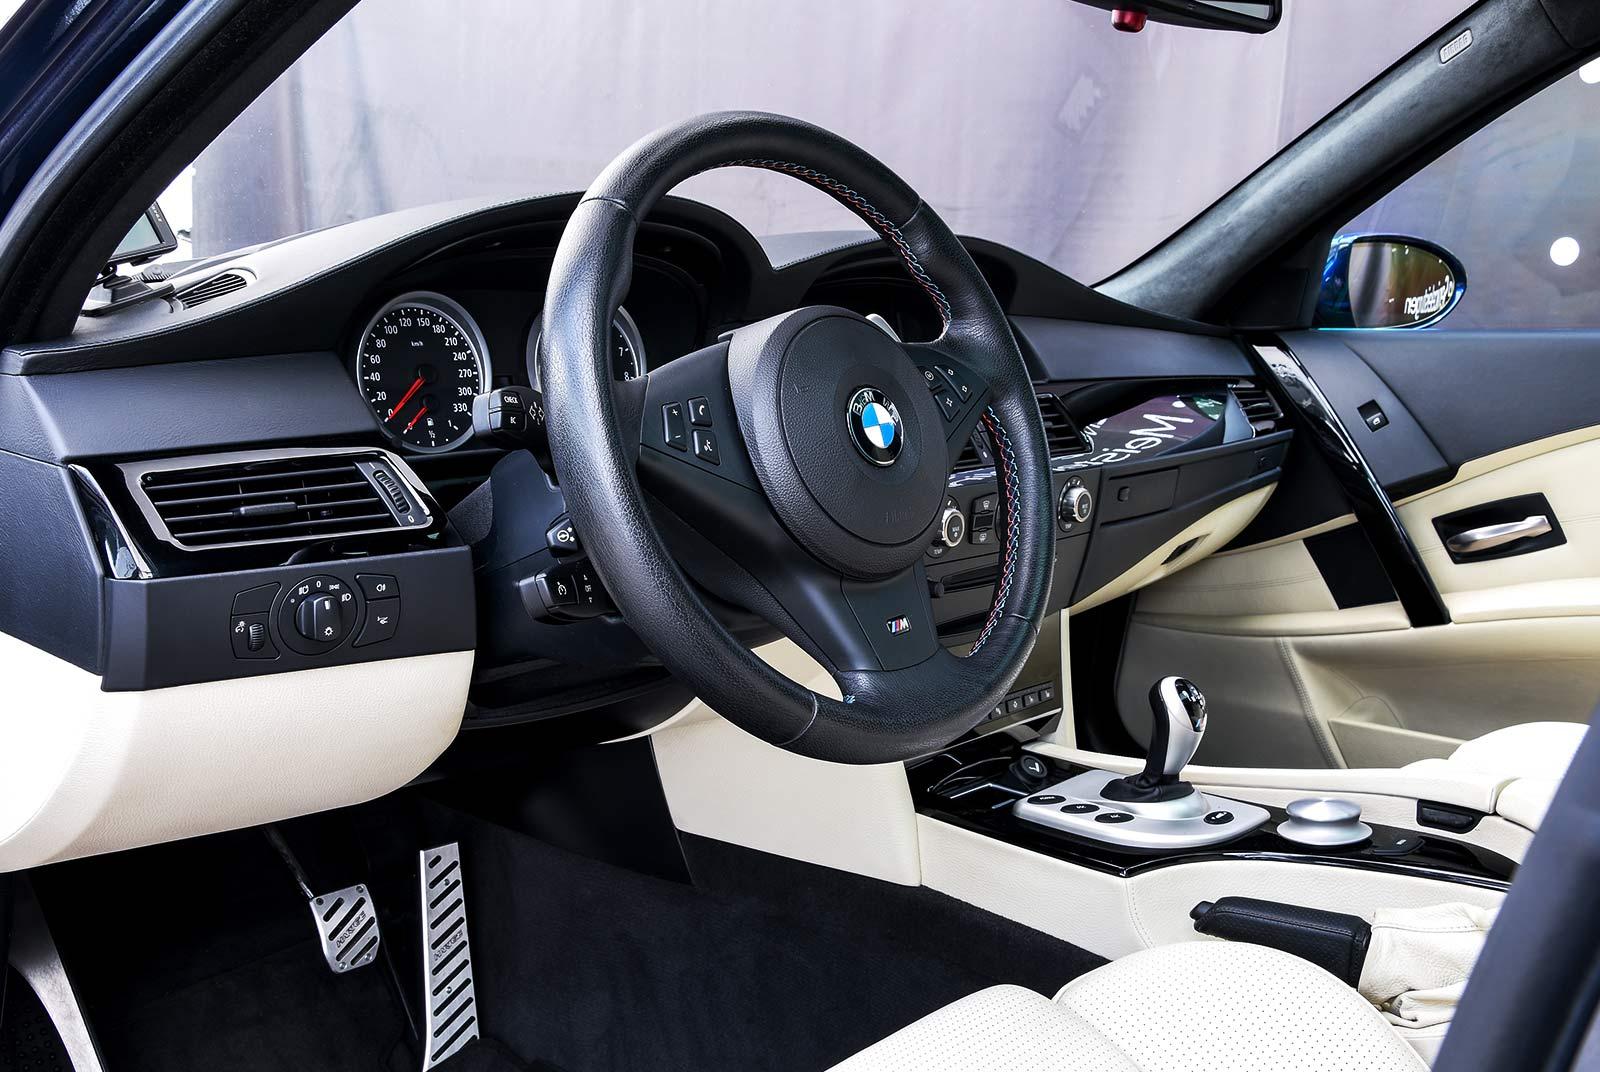 bmw_m_5_blaulila_creme_BMW-2353_09